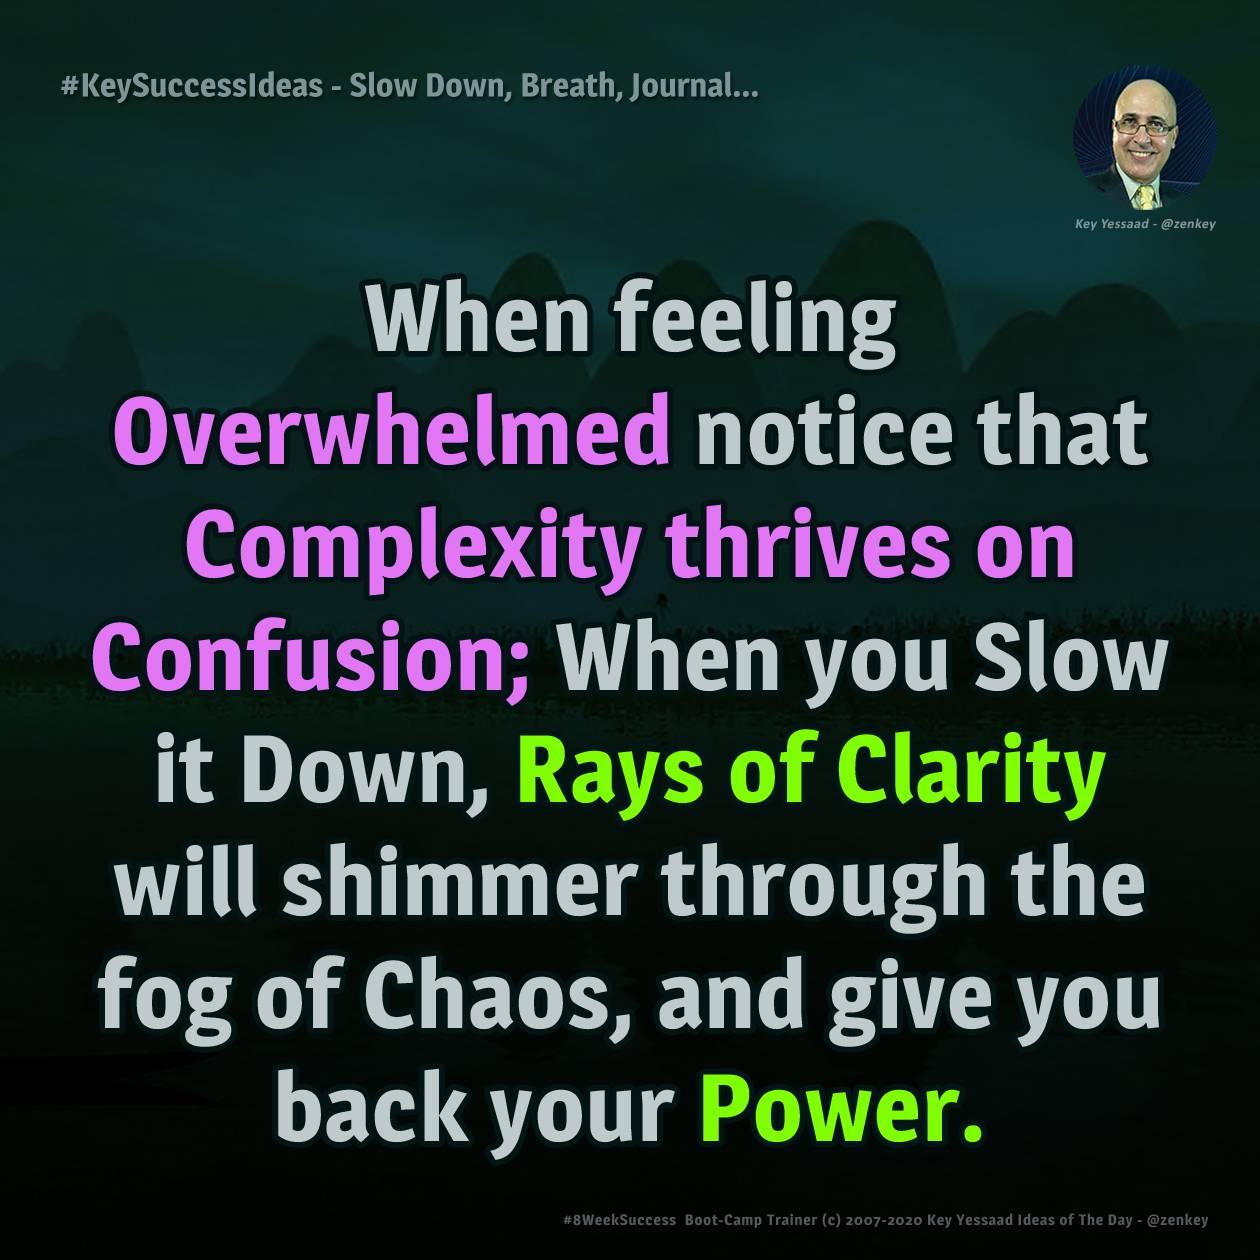 #KeySuccessIdeas - Slow Down, Breath, Journal...